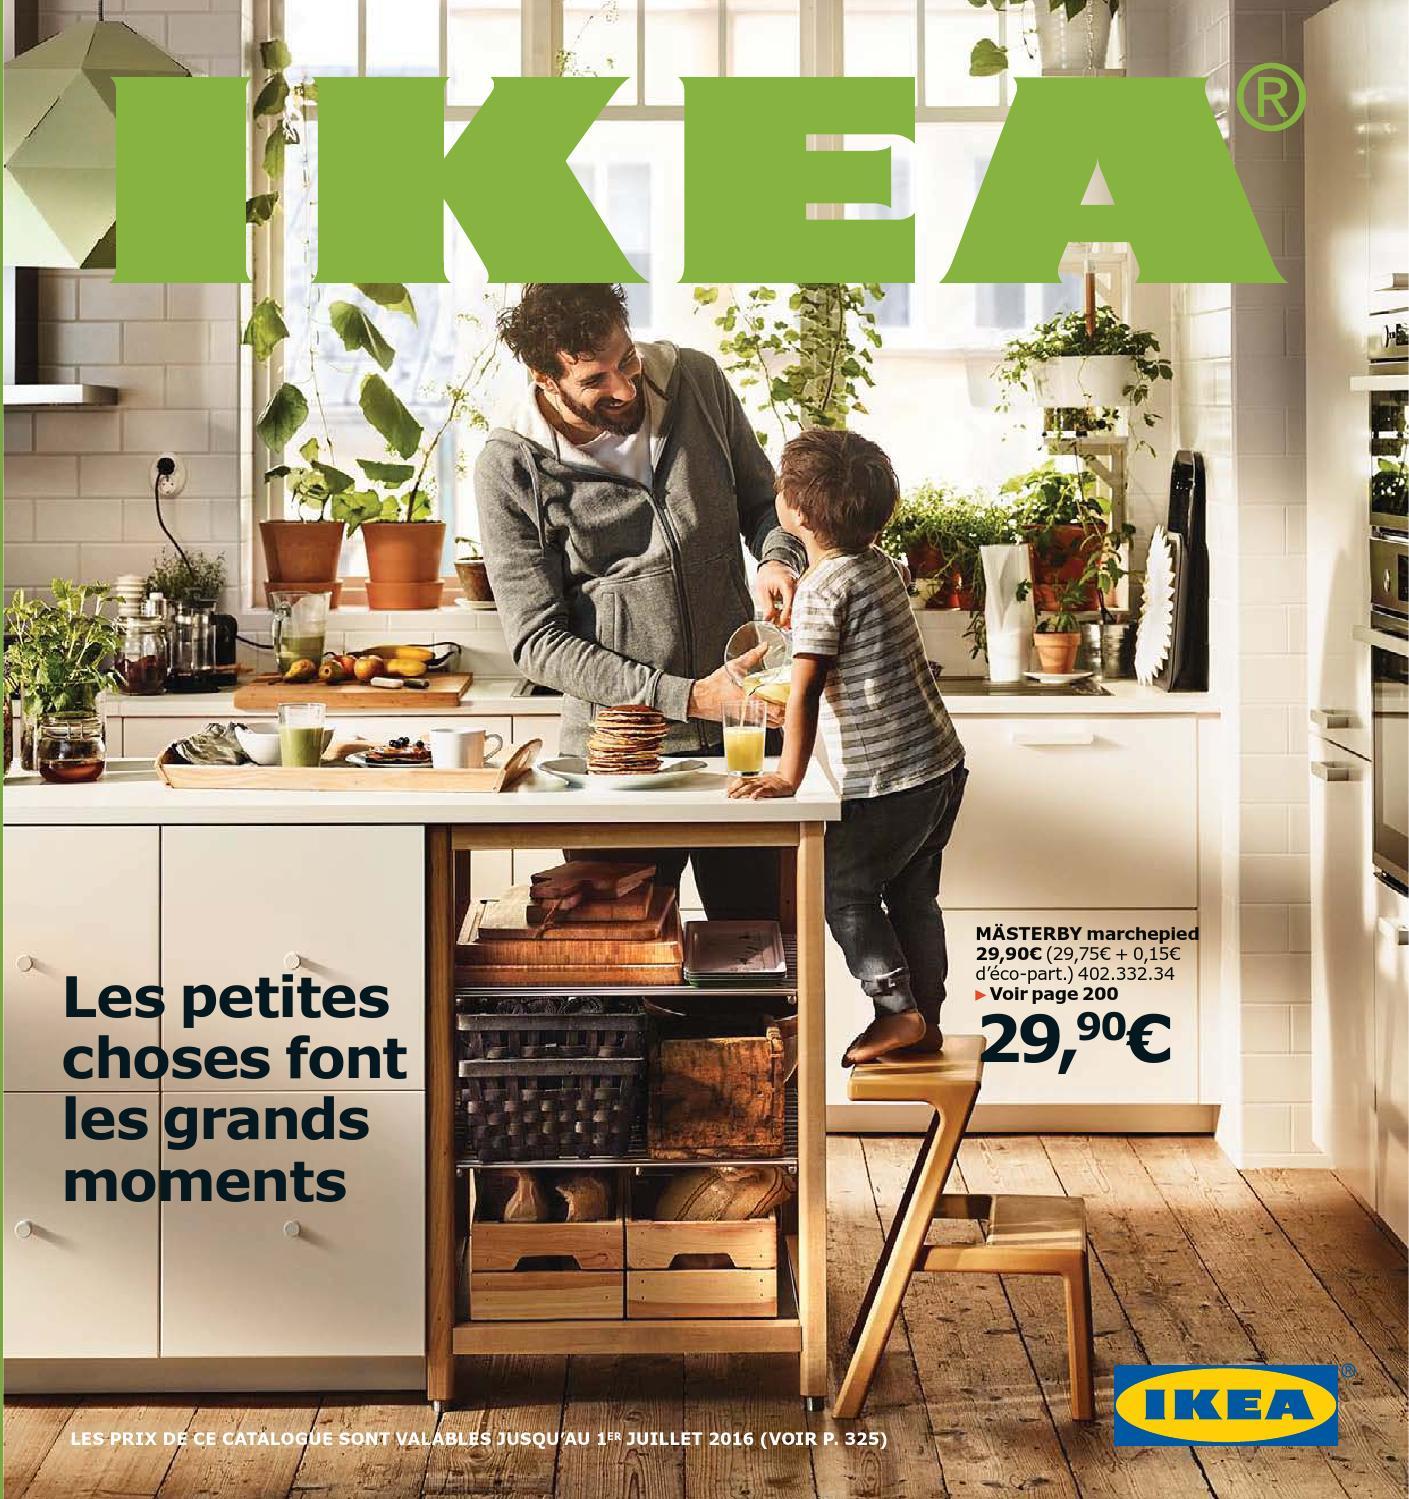 Ikea catalogue 2016 by Margot Ziegler - issuu